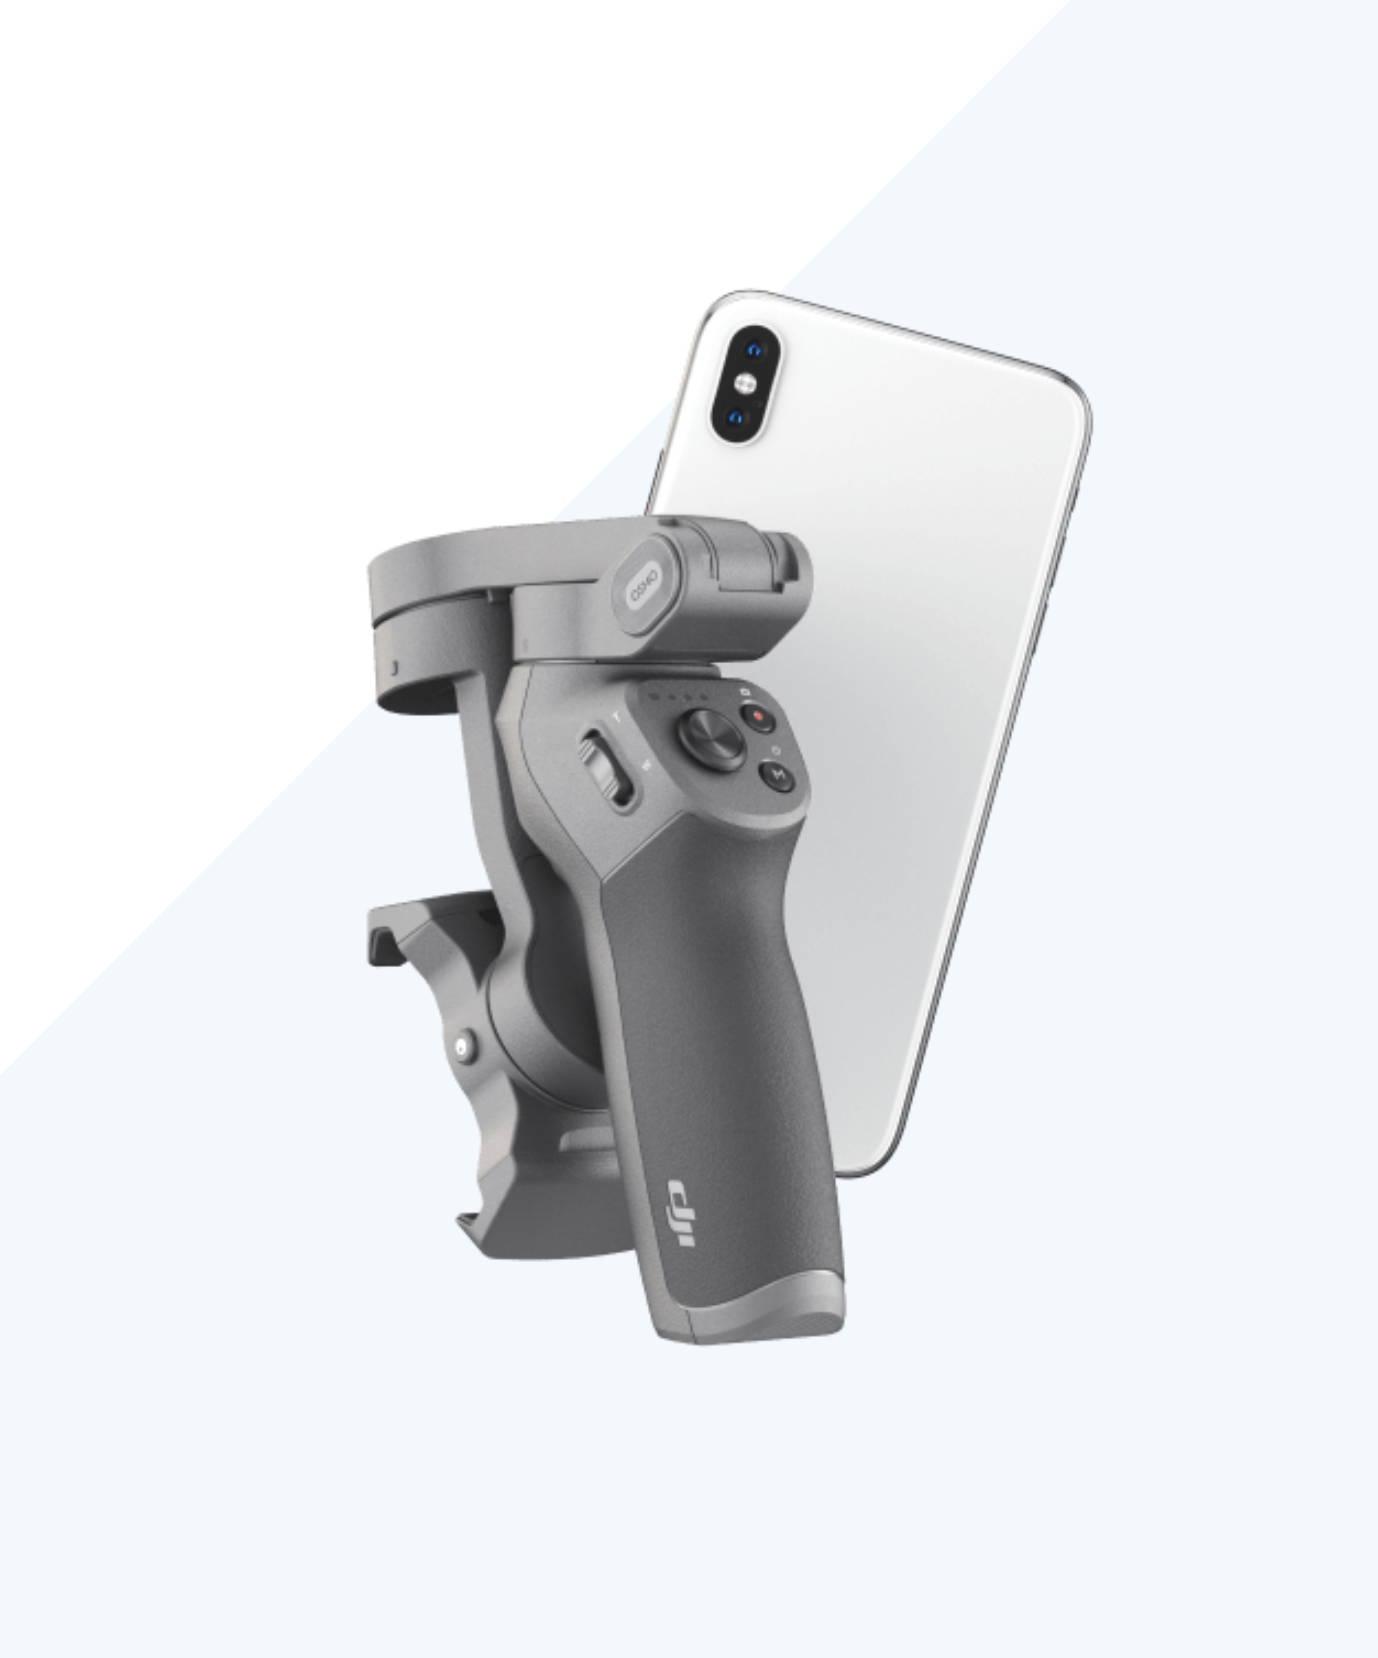 Osmo Mobile 3 fold down design